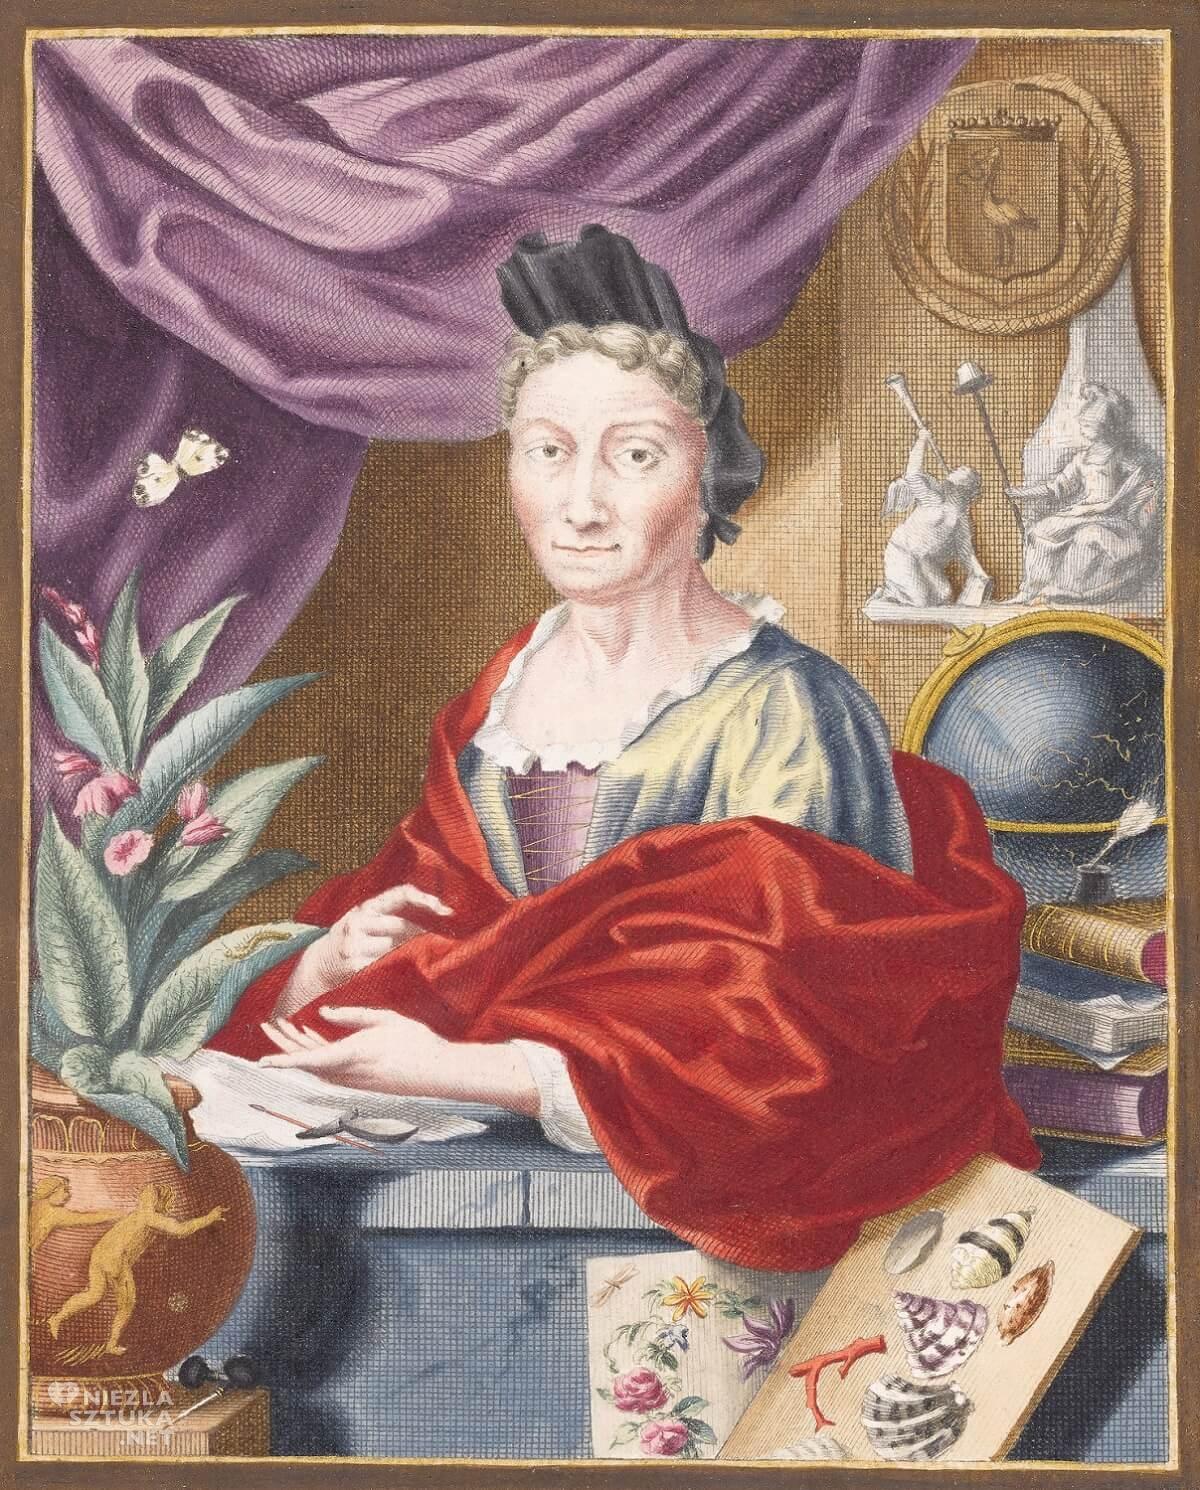 Jacobus Houbraken, Anna Maria Sibylla Merian, kobiety w sztuce, biologia, rysunki, Niezła Sztuka